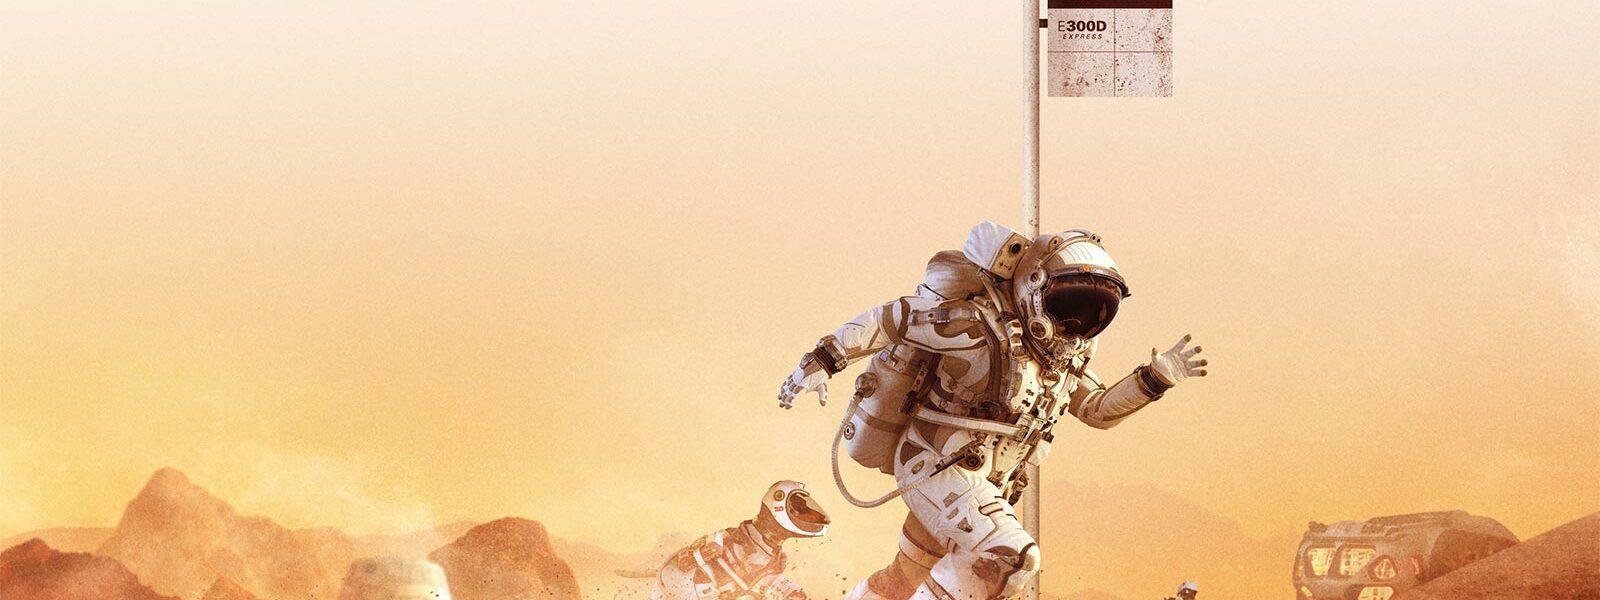 Astronaut and dog on Mars